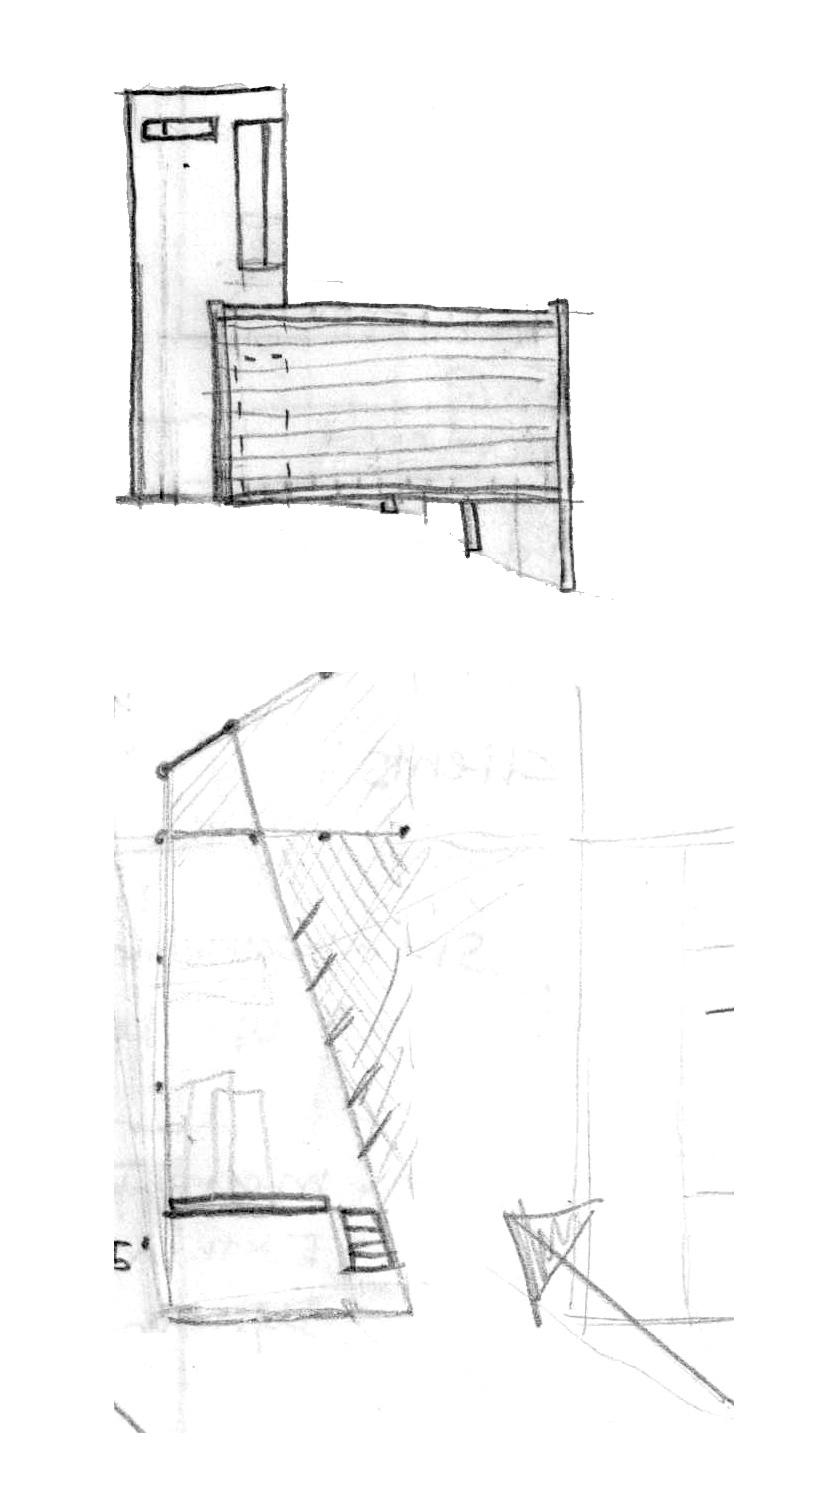 maffei-sketch.jpg